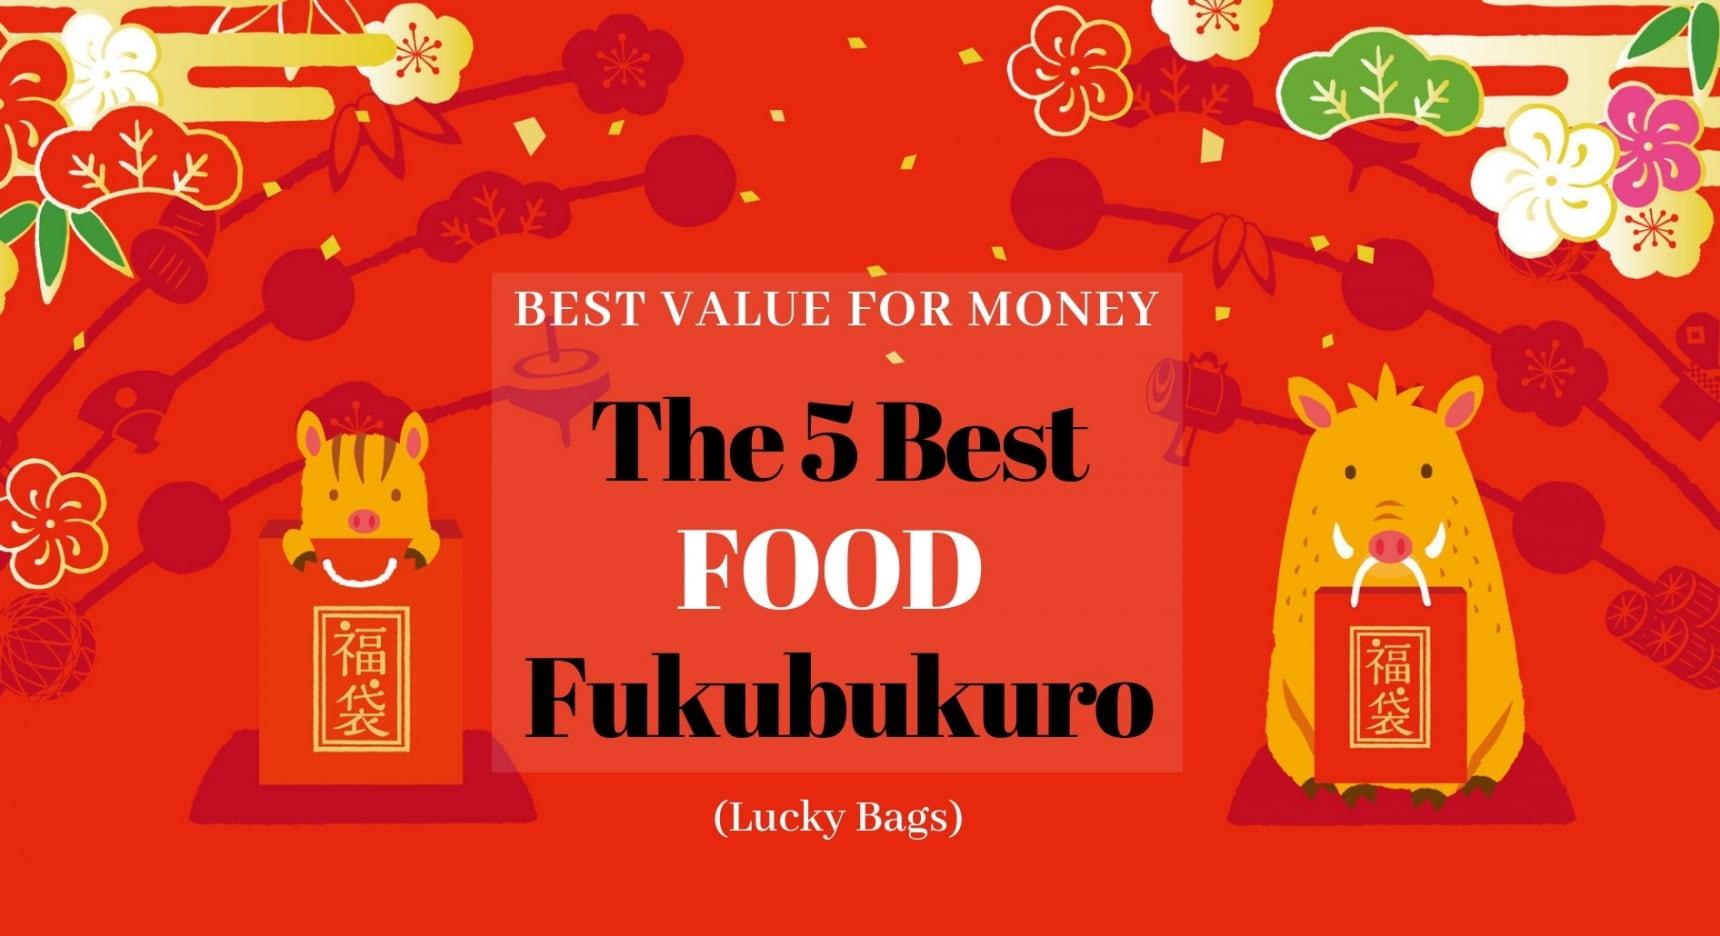 The 5 Best Value-for-Money Food Fukubukuro